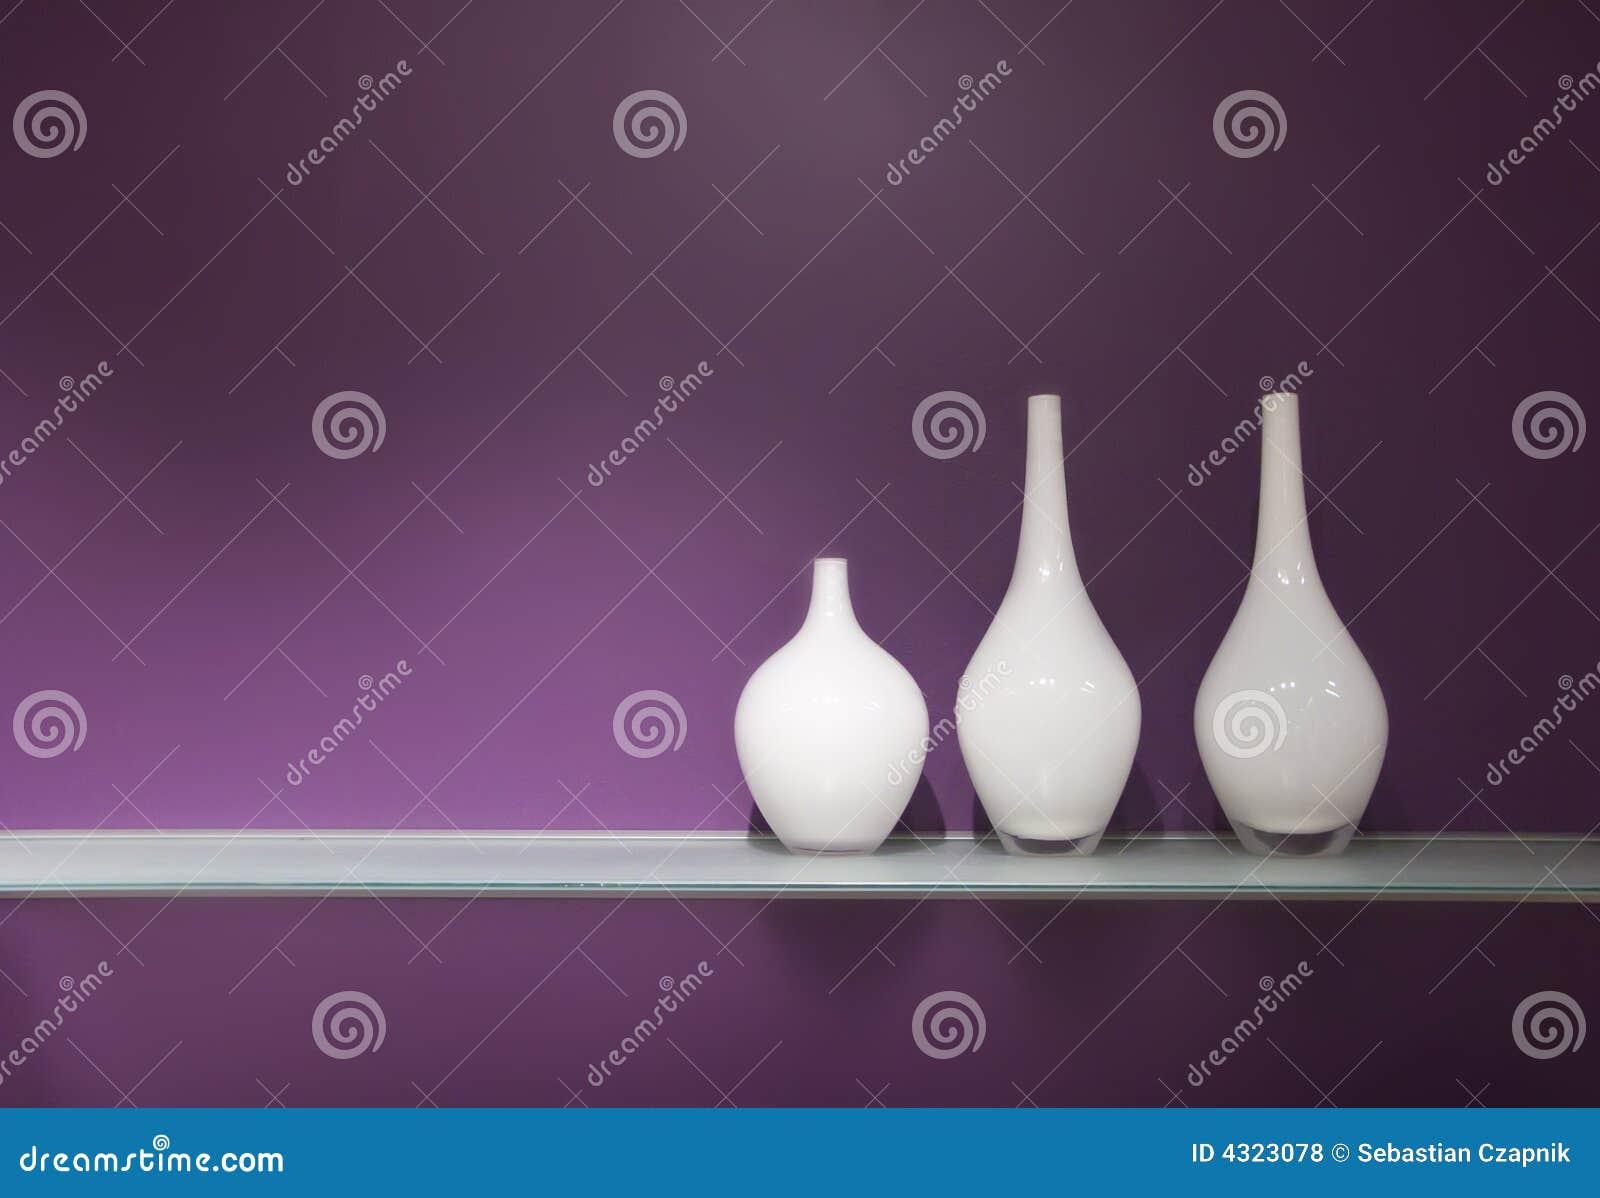 Tre vasi di vetro fotografie stock libere da diritti for Vasi ermetici vetro